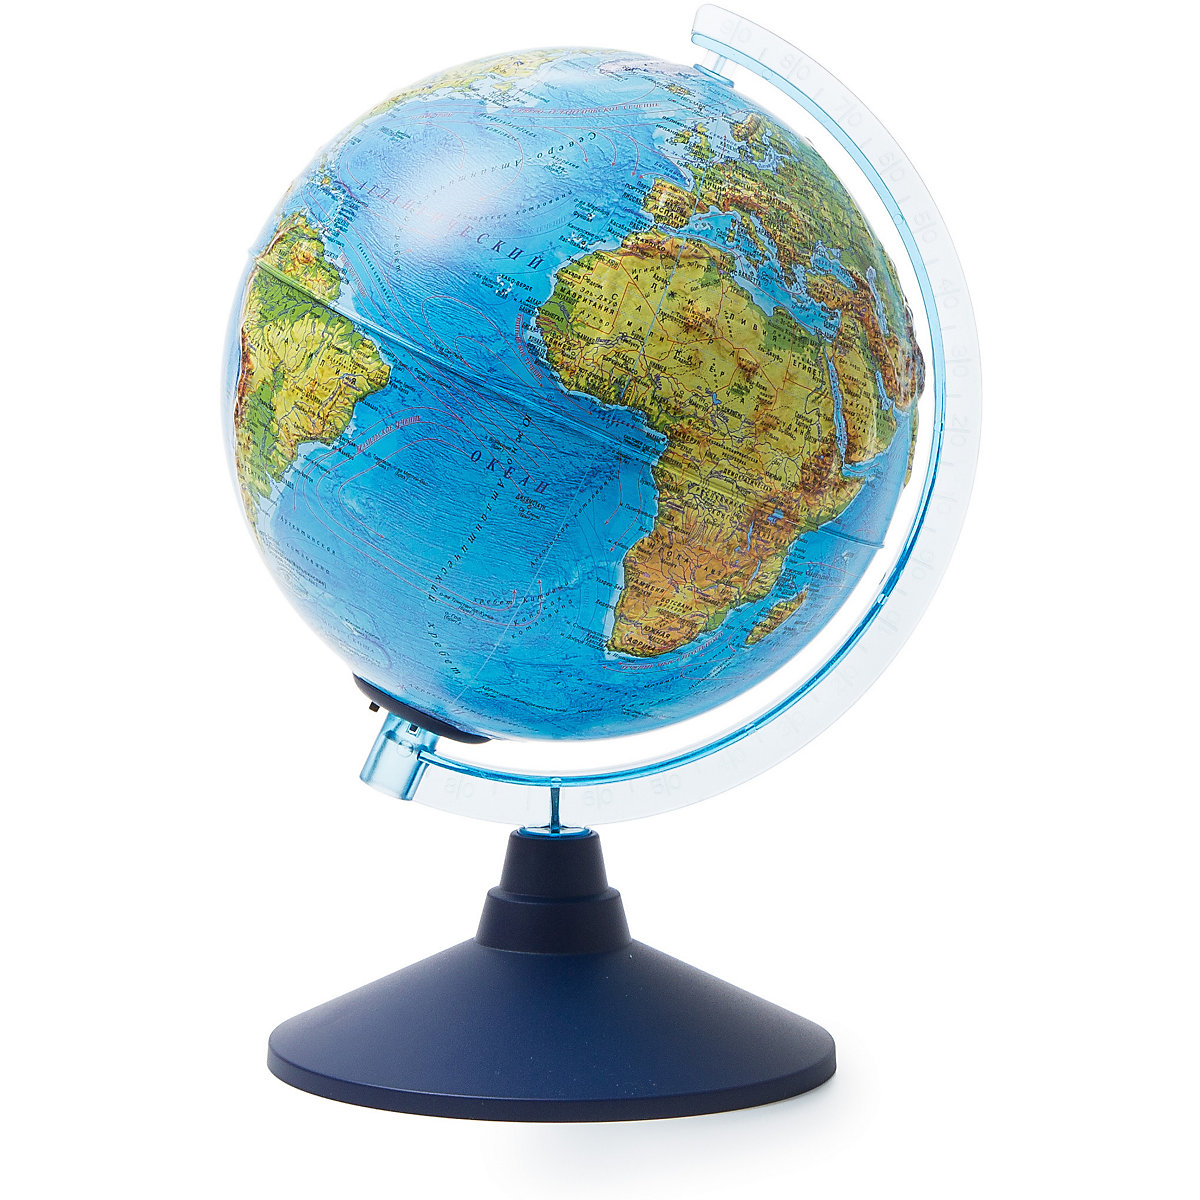 GLOBEN Desk Set 8075083 Globe Accessories Organizer For Office And School Schools Offices MTpromo